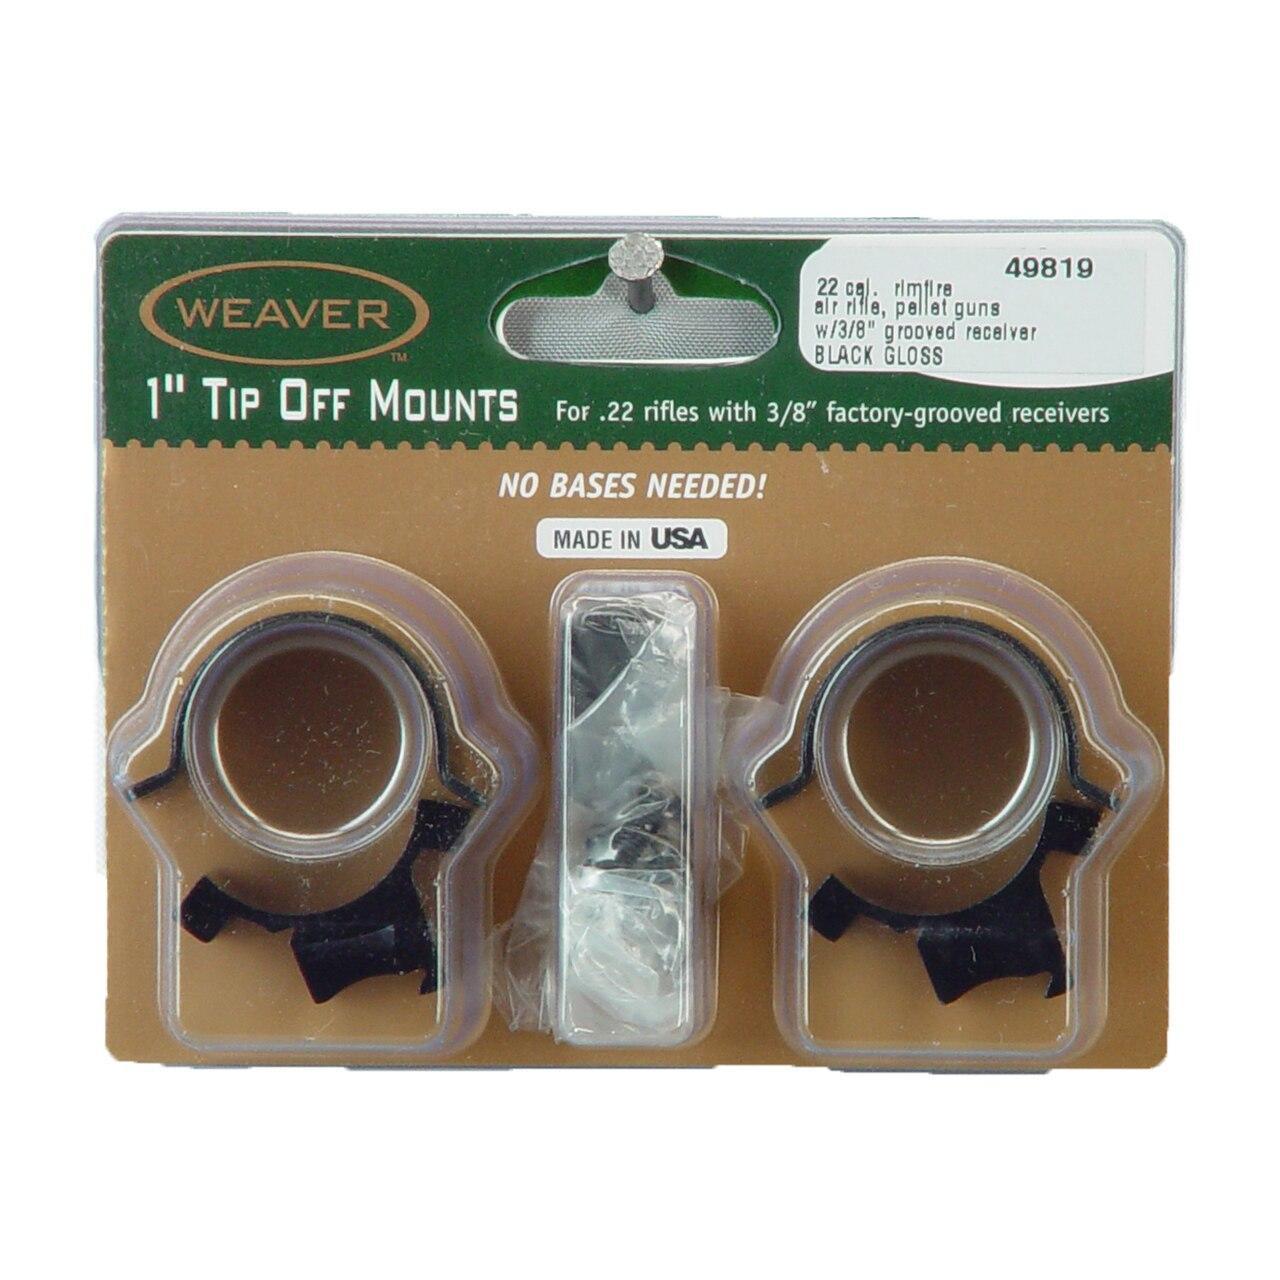 Weaver Weaver Sure Grip Tip Off 1 Gloss 076683498199